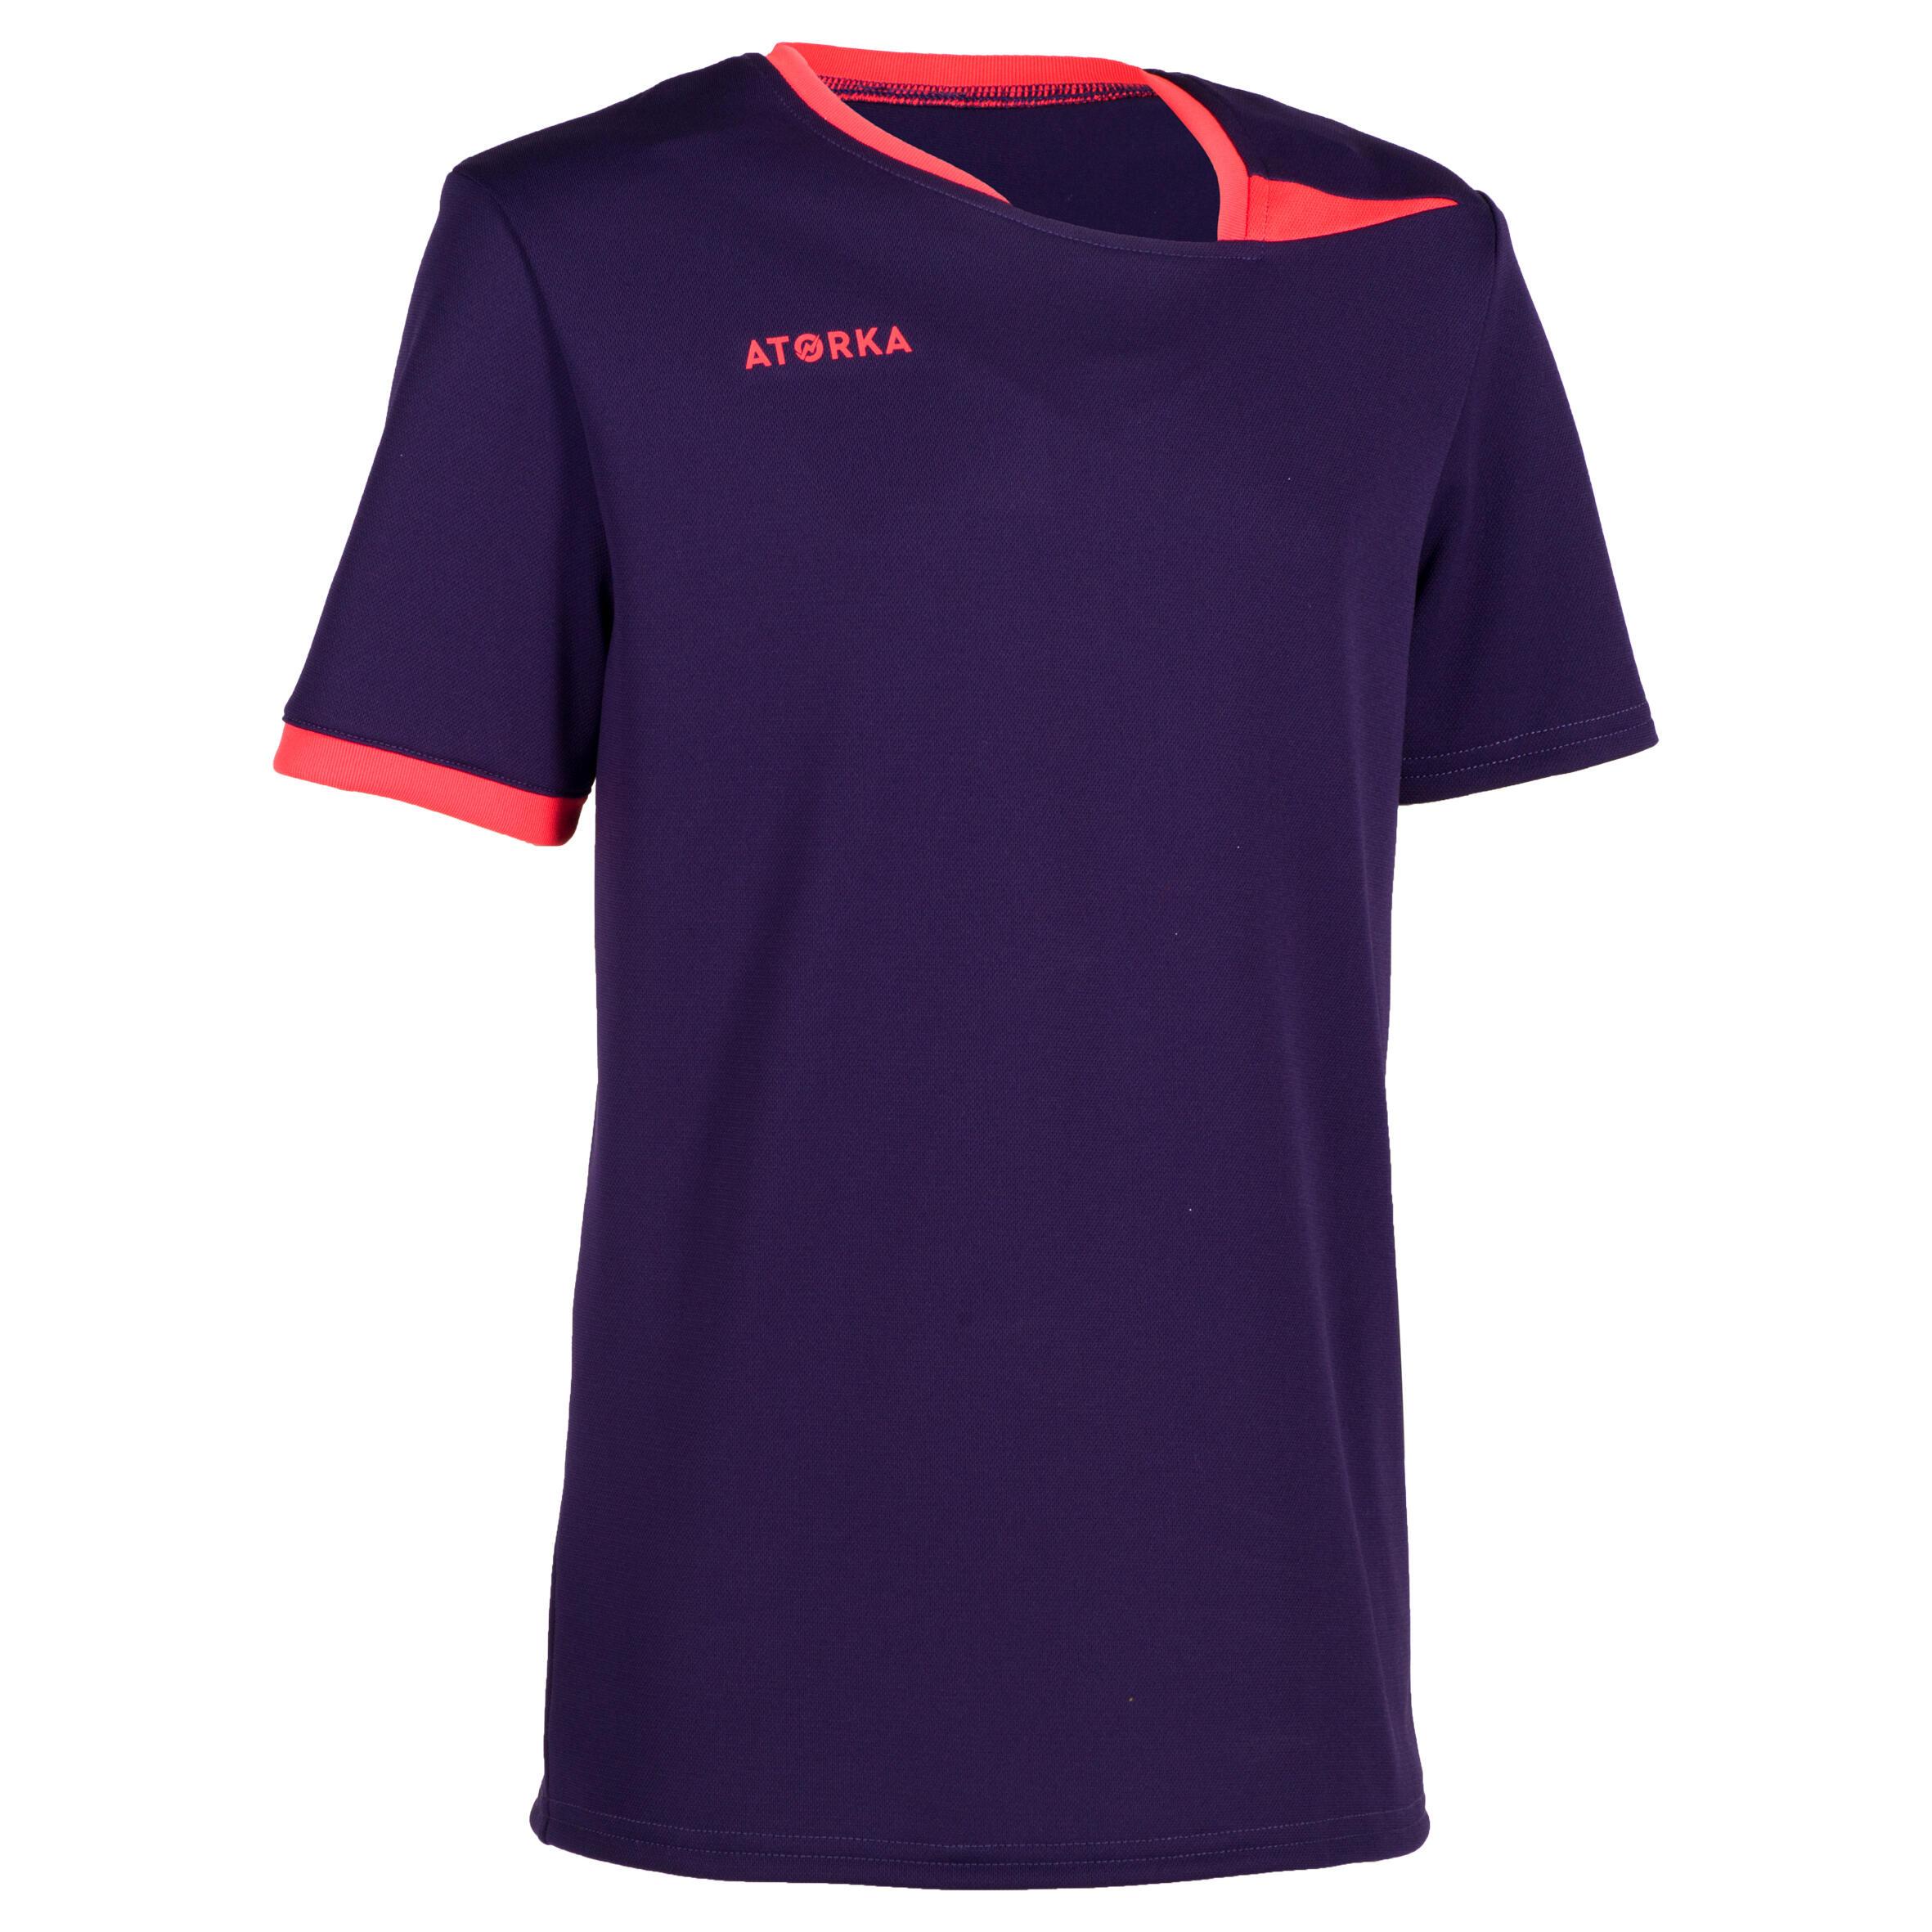 Atorka Handbalshirt meisjes H100